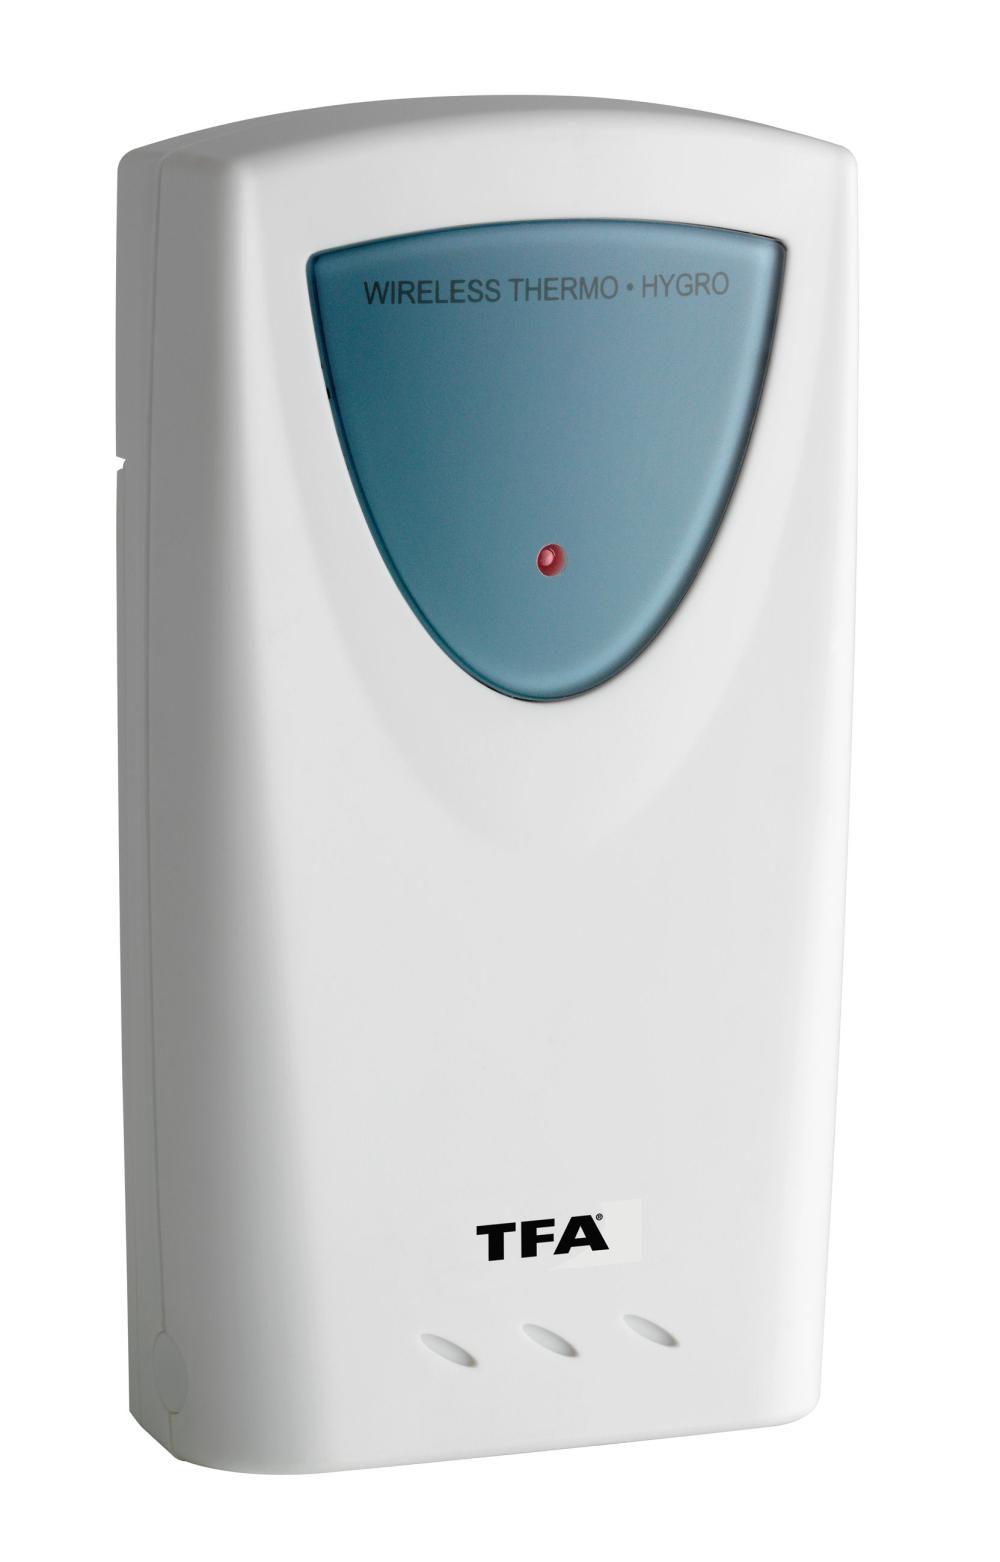 Náhradní bezdrátové čidlo teploty a vlhkosti TFA 30.3165